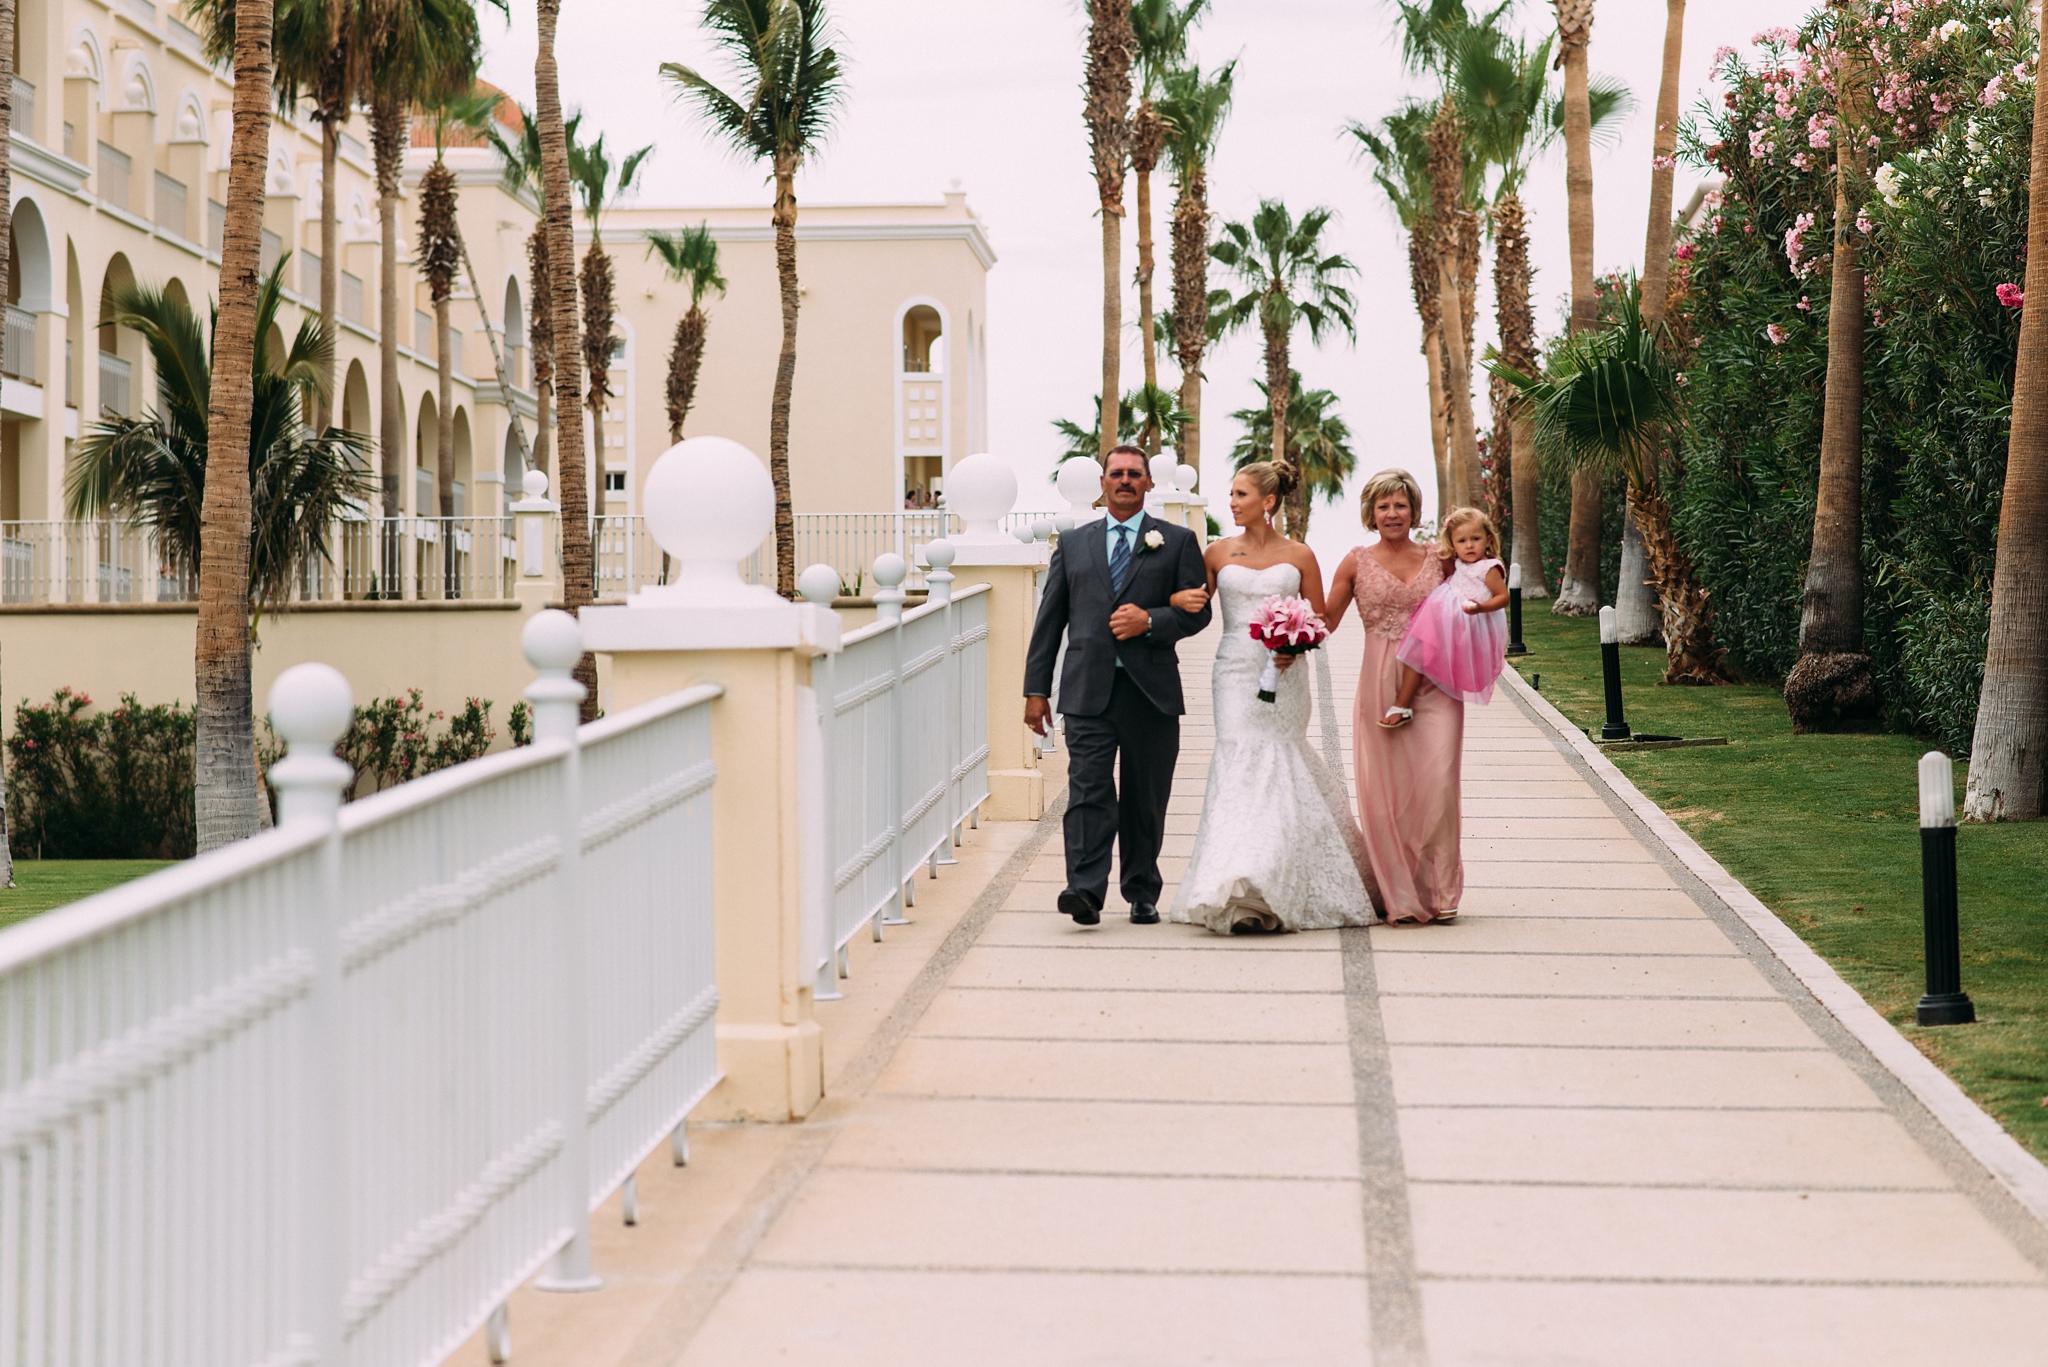 kaihla_tonai_intimate_wedding_elopement_photographer_1344